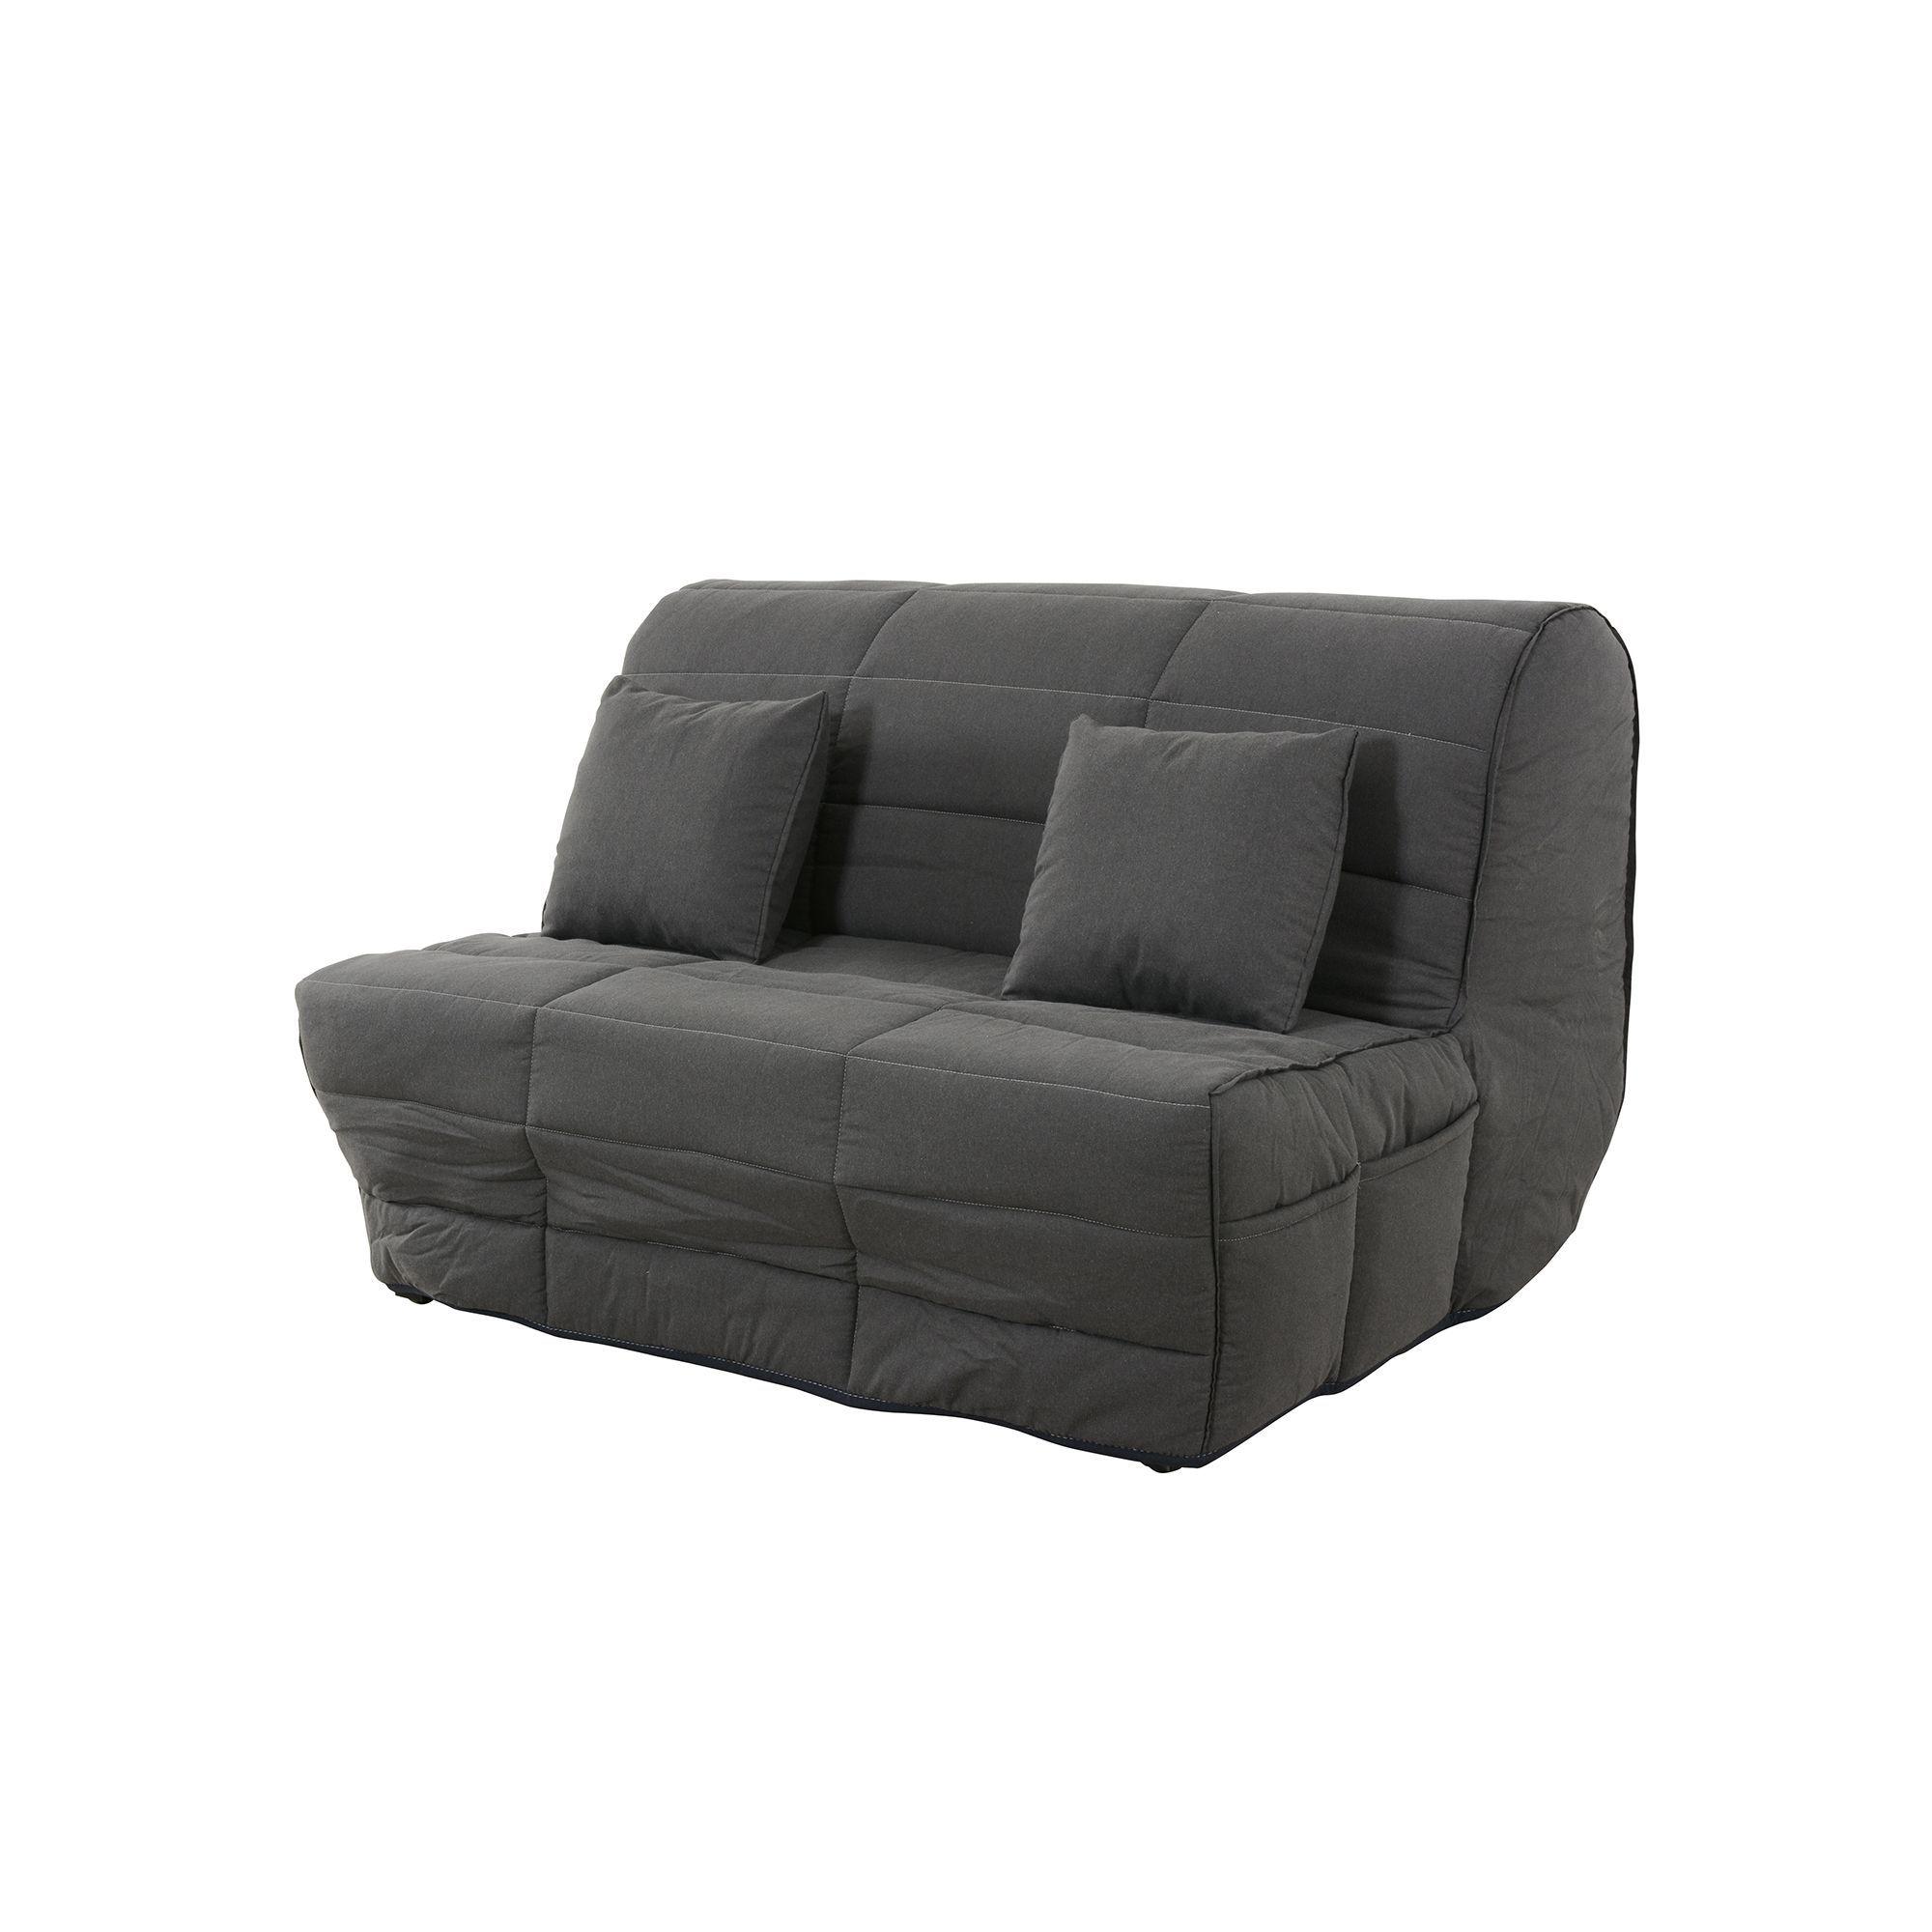 bz housse latest housse de bz horizon tutti tempo rouge tutti tempo uac with bz housse amazing. Black Bedroom Furniture Sets. Home Design Ideas